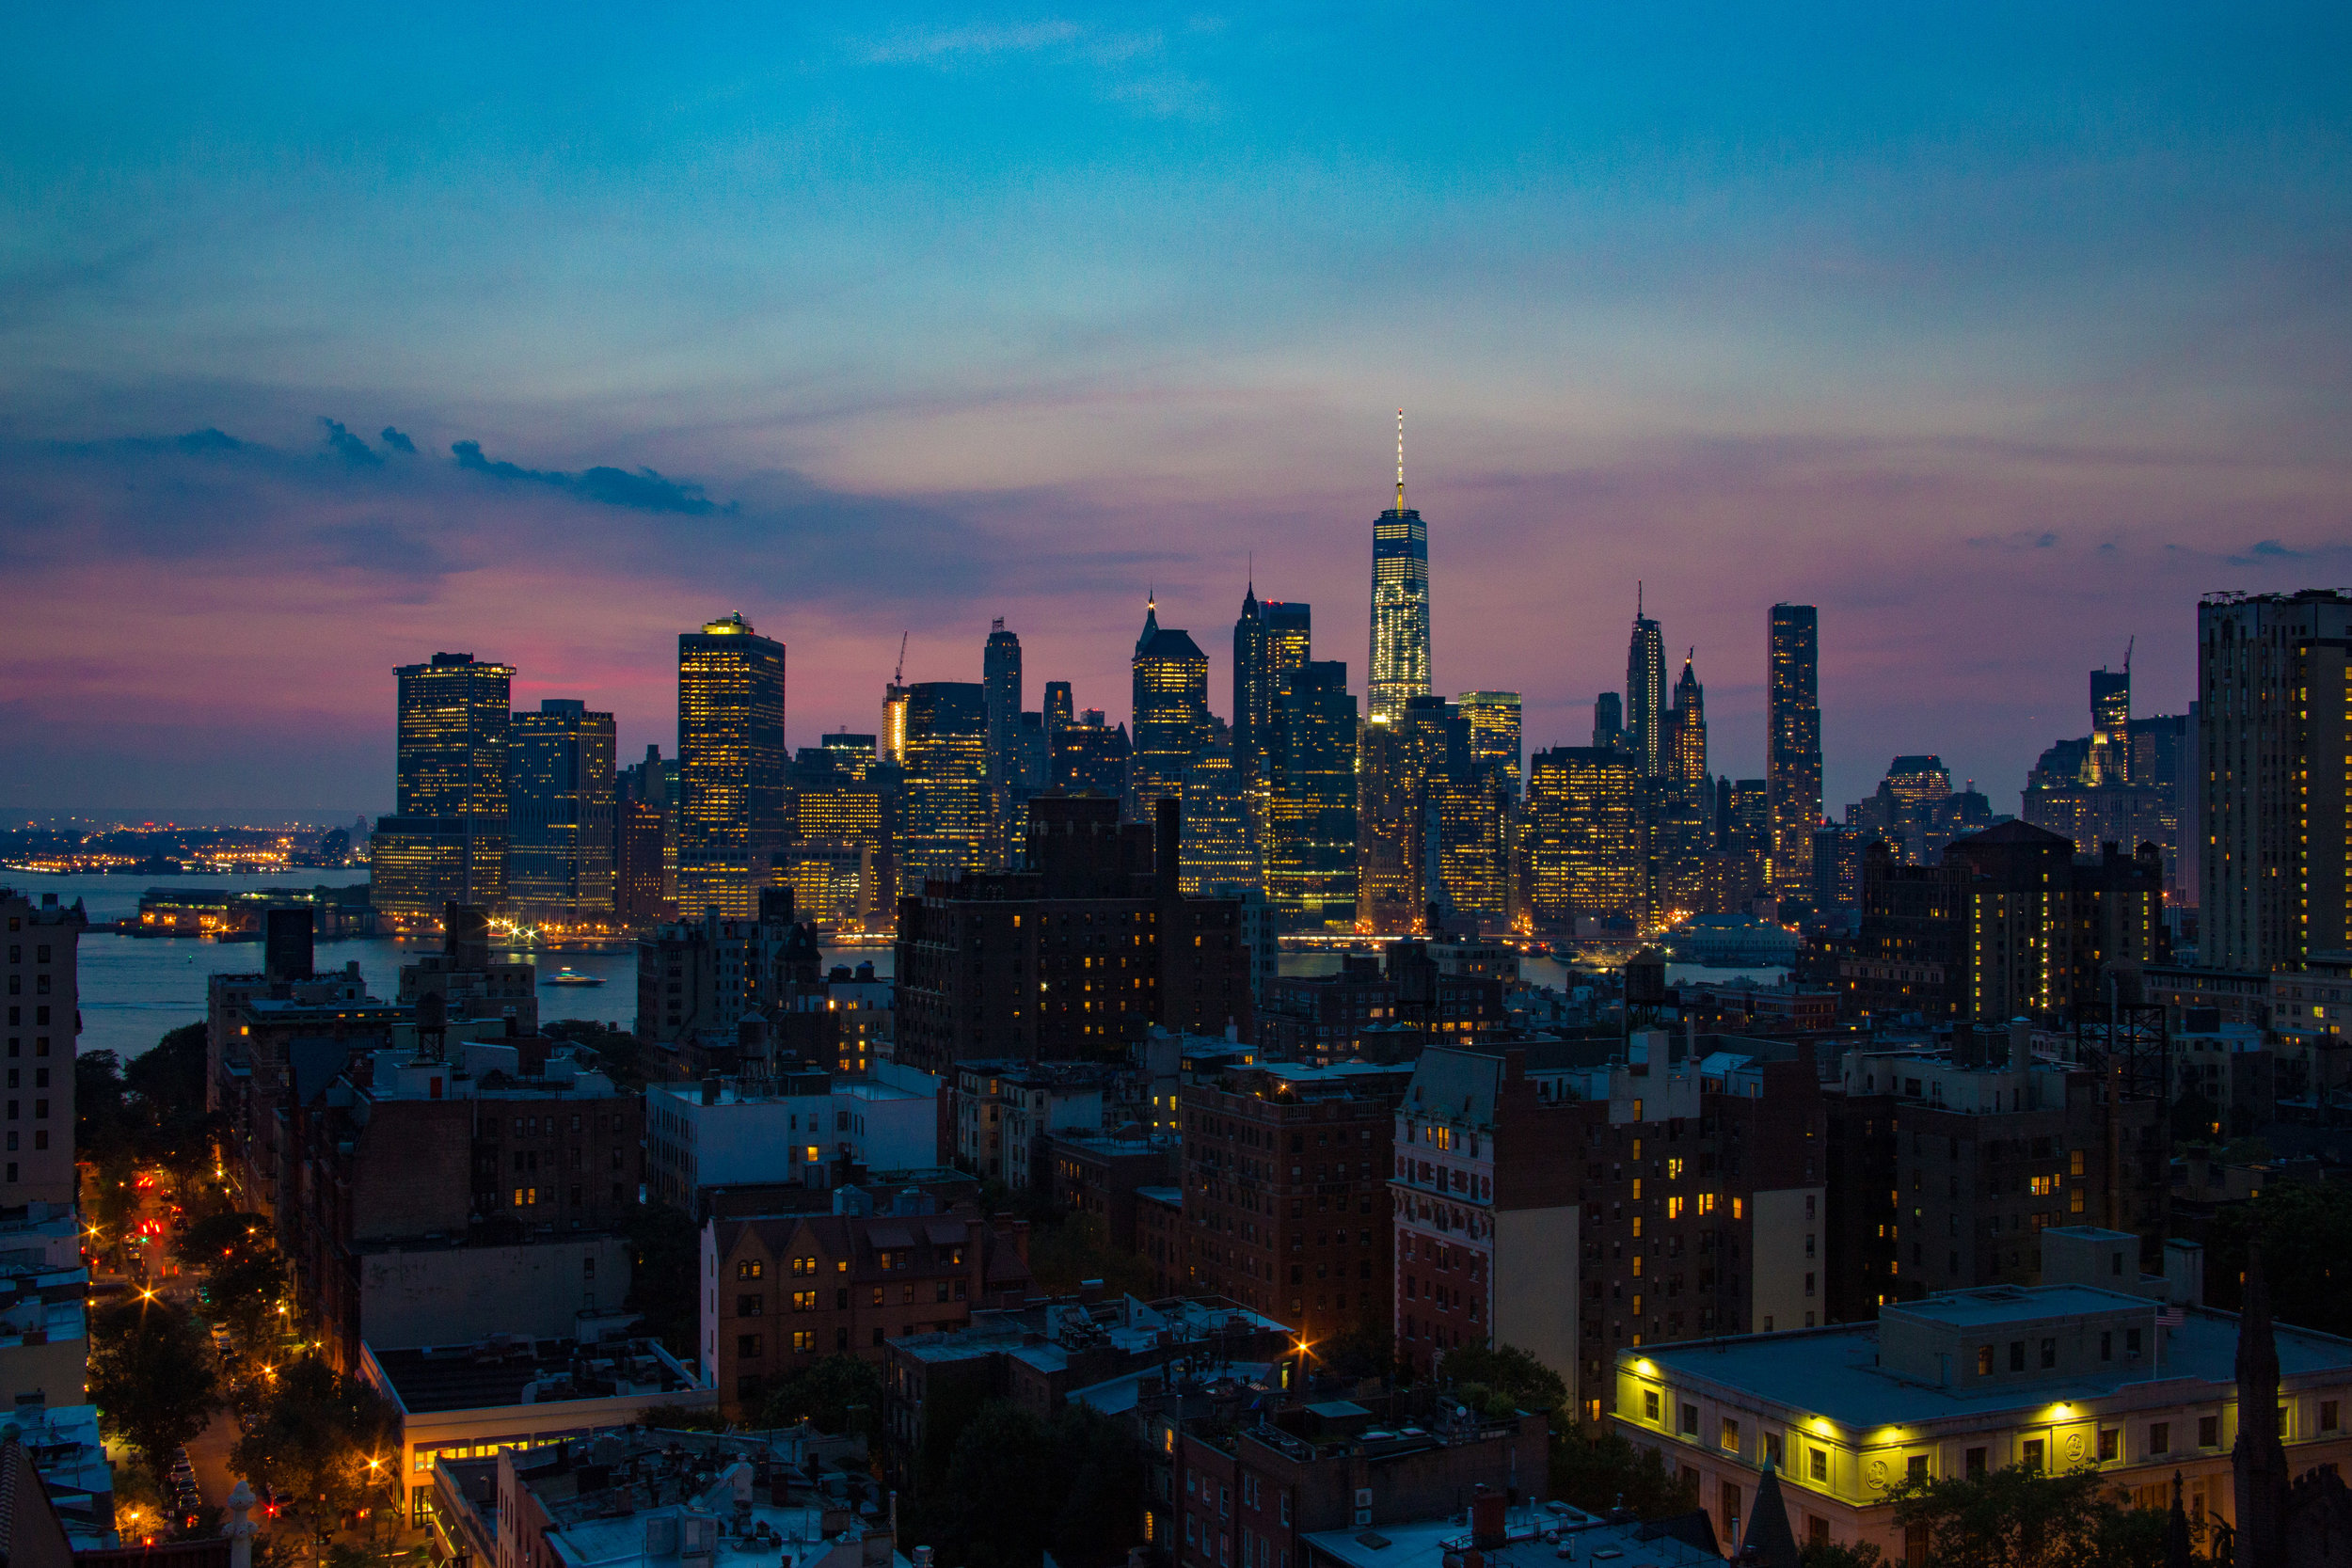 LSNY_Night_City_Views-35.jpg